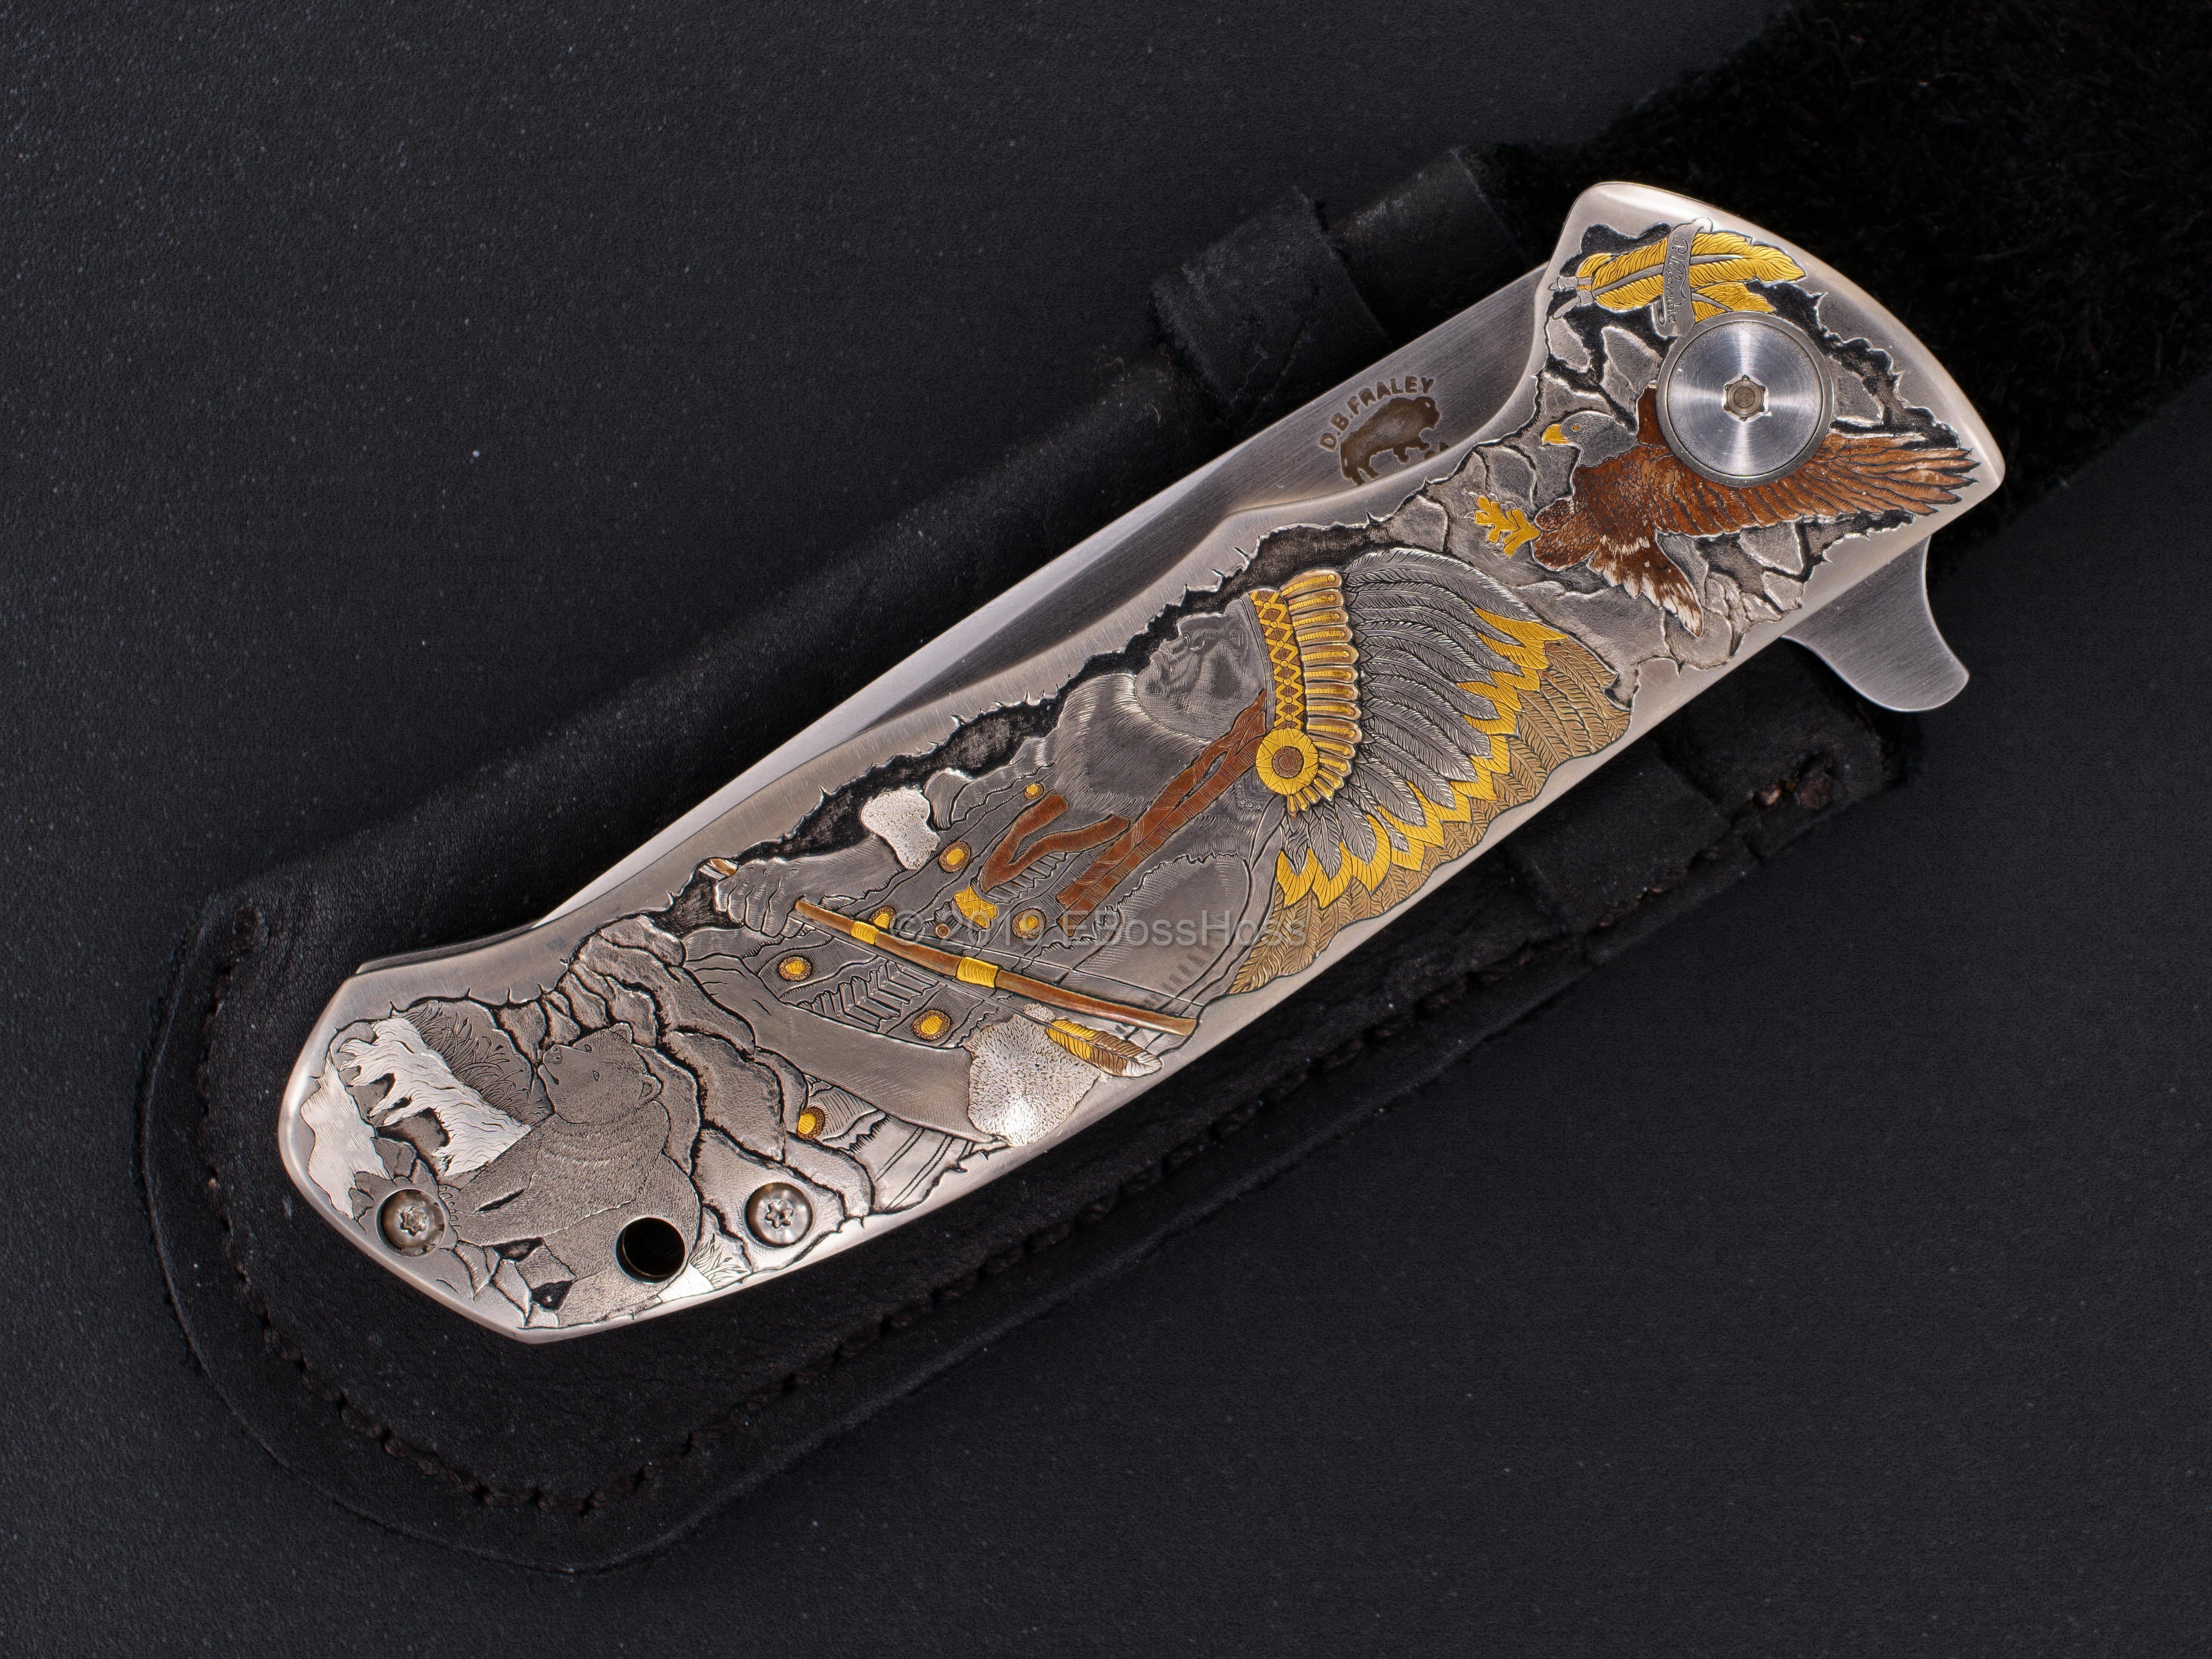 D.B. Fraley Custom Torrent Flipper - Masterfully engraved by Pedro Villarrubia